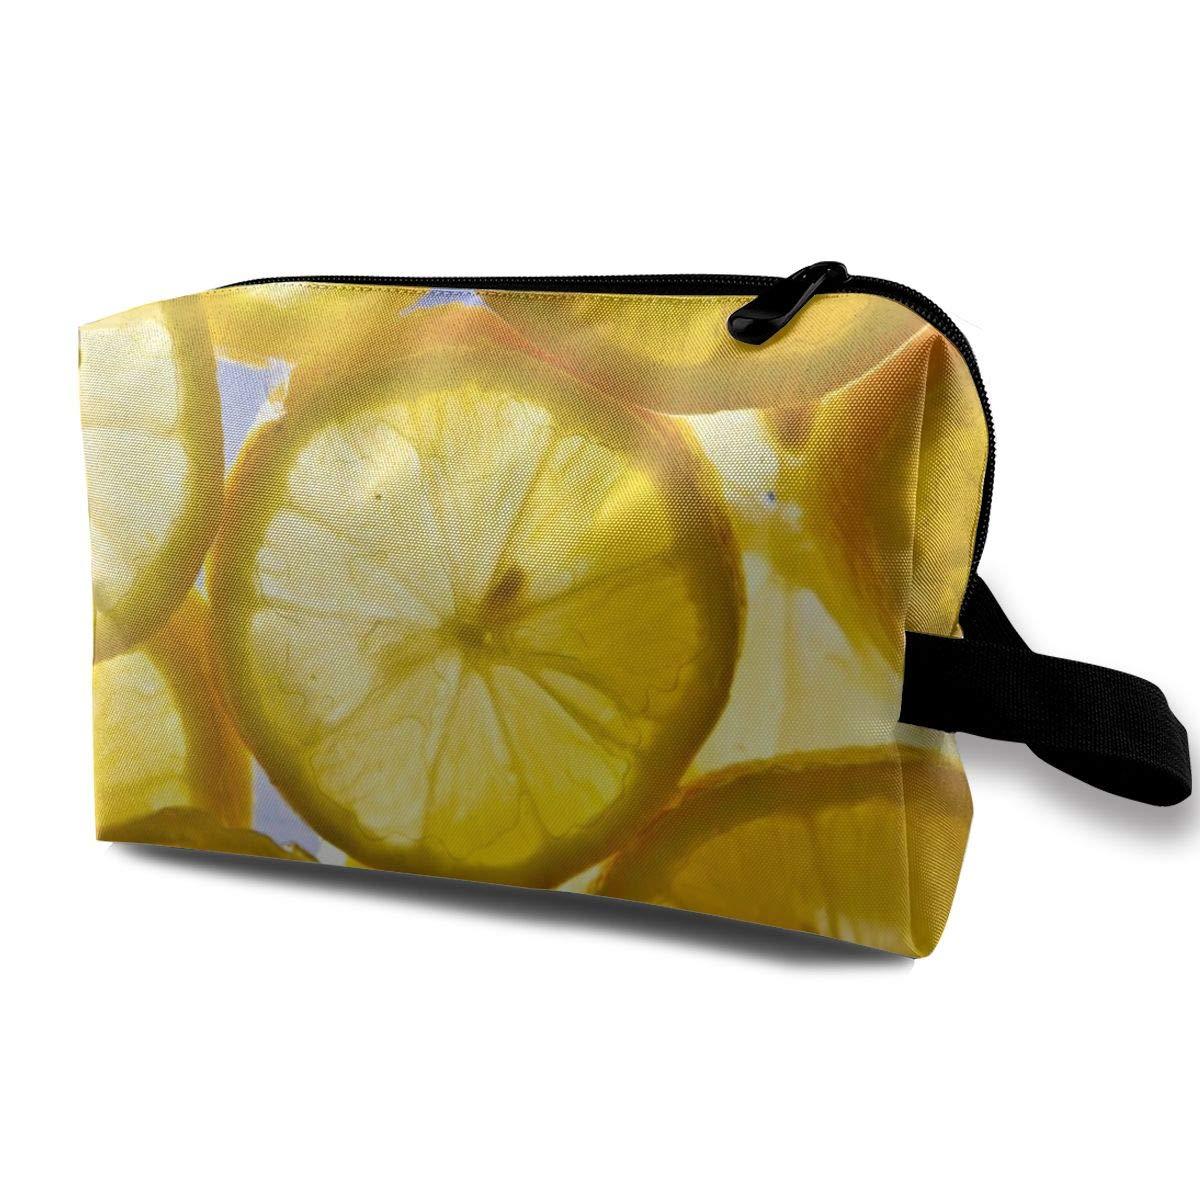 Orange And Lemon Pattern Toiletry Bag Multifunction Cosmetic Bag Portable Makeup Pouch Travel Organizer Bag For Women Girls